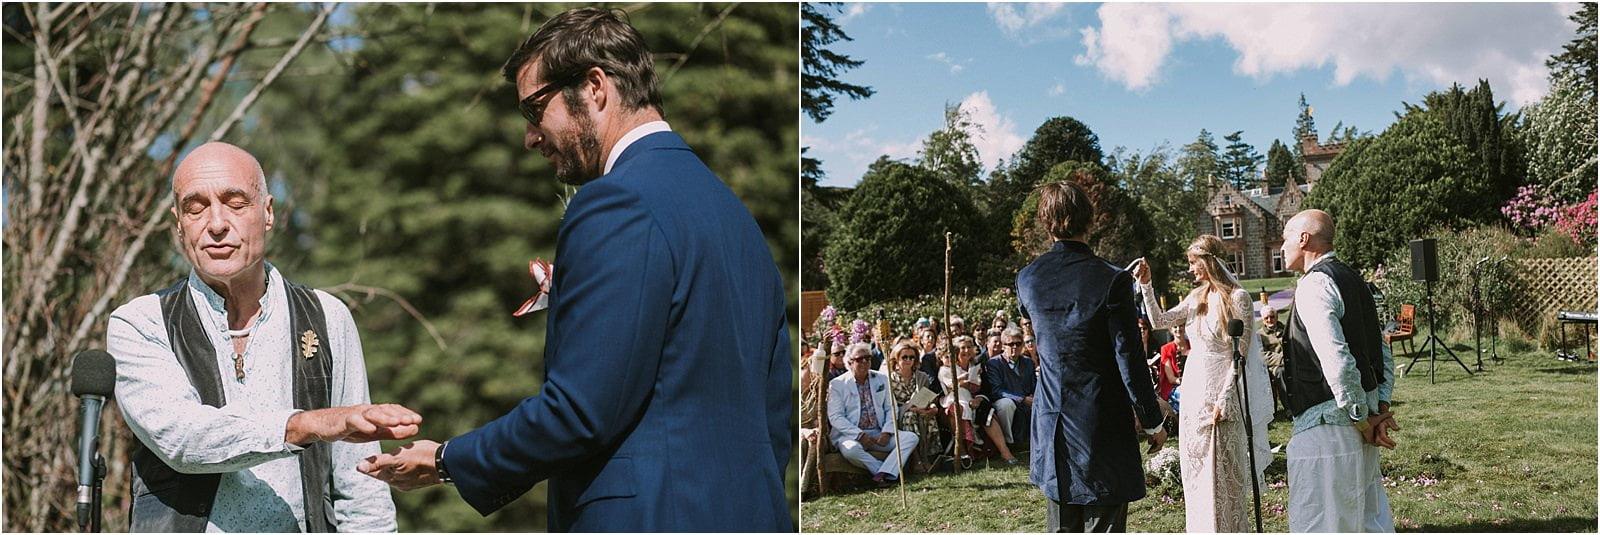 spiritual wedding photography